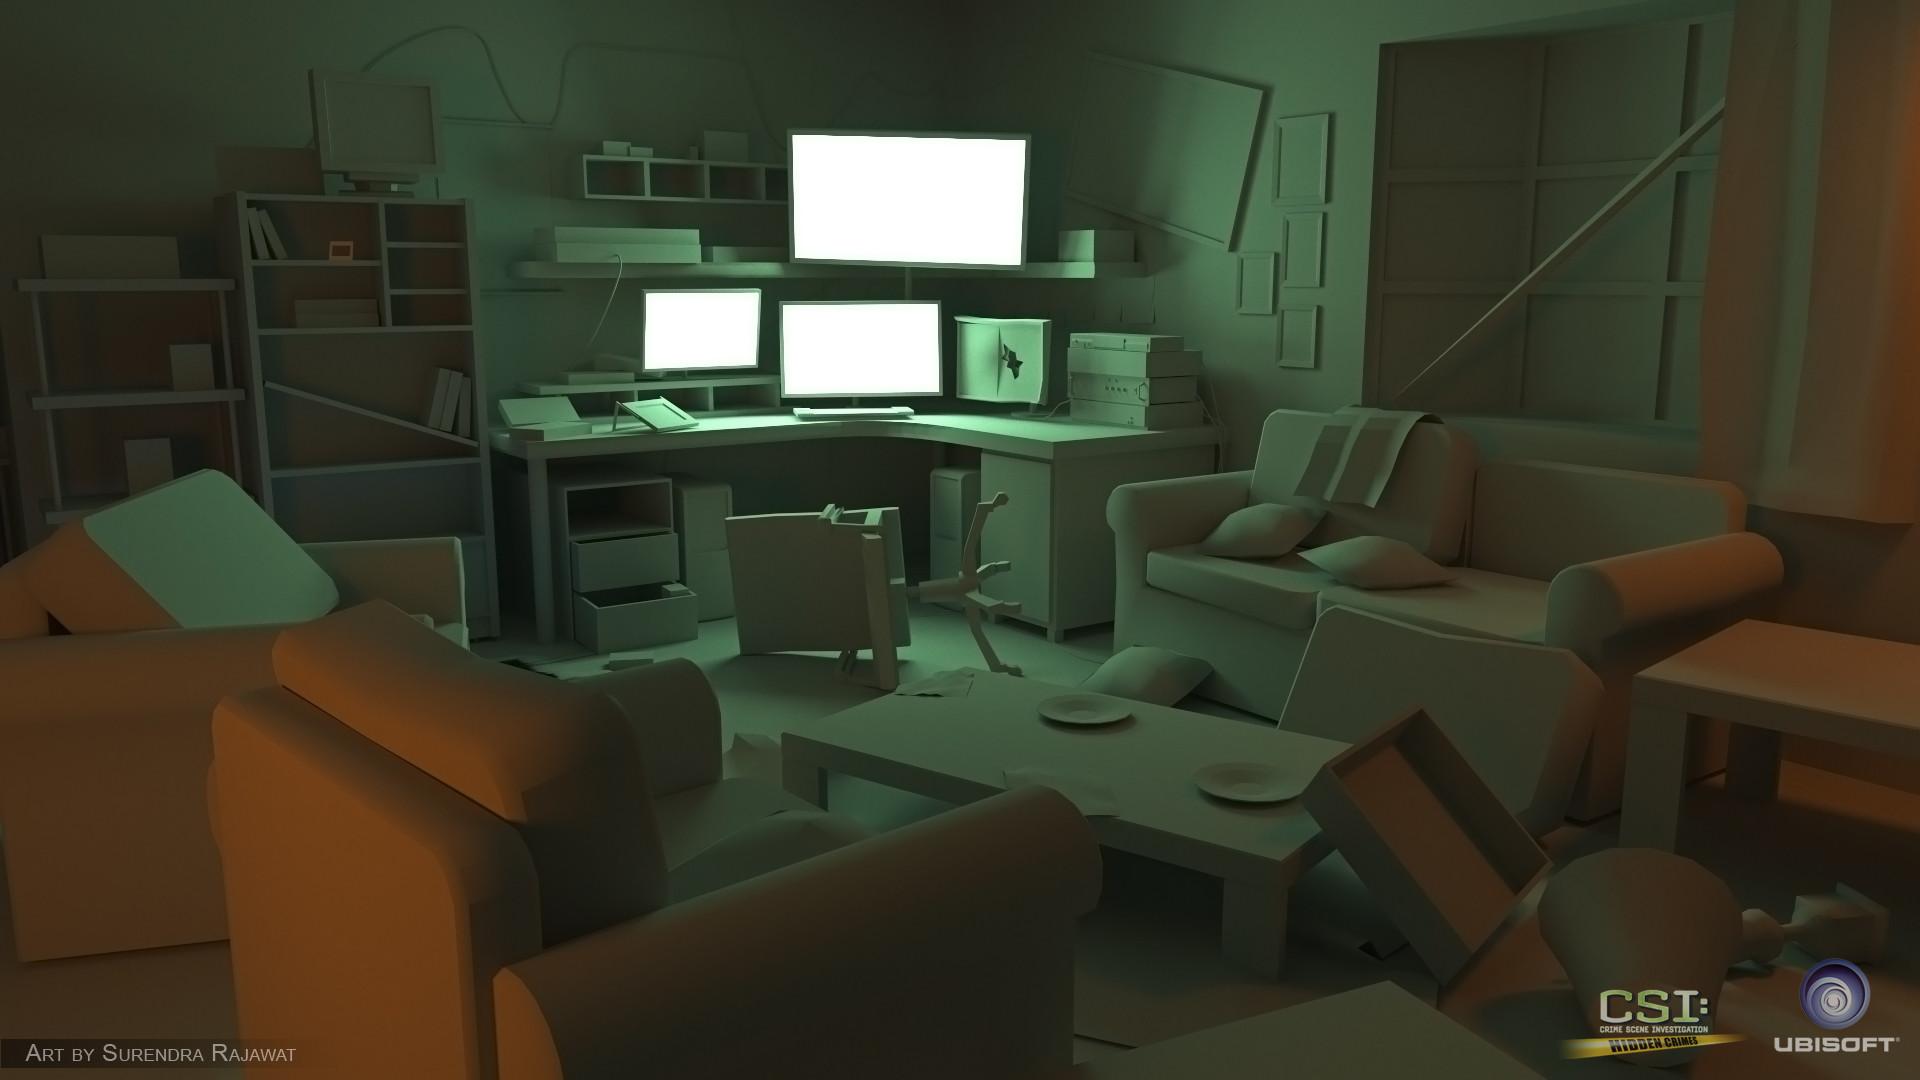 Surendra pratap singh rajawat living room 3d